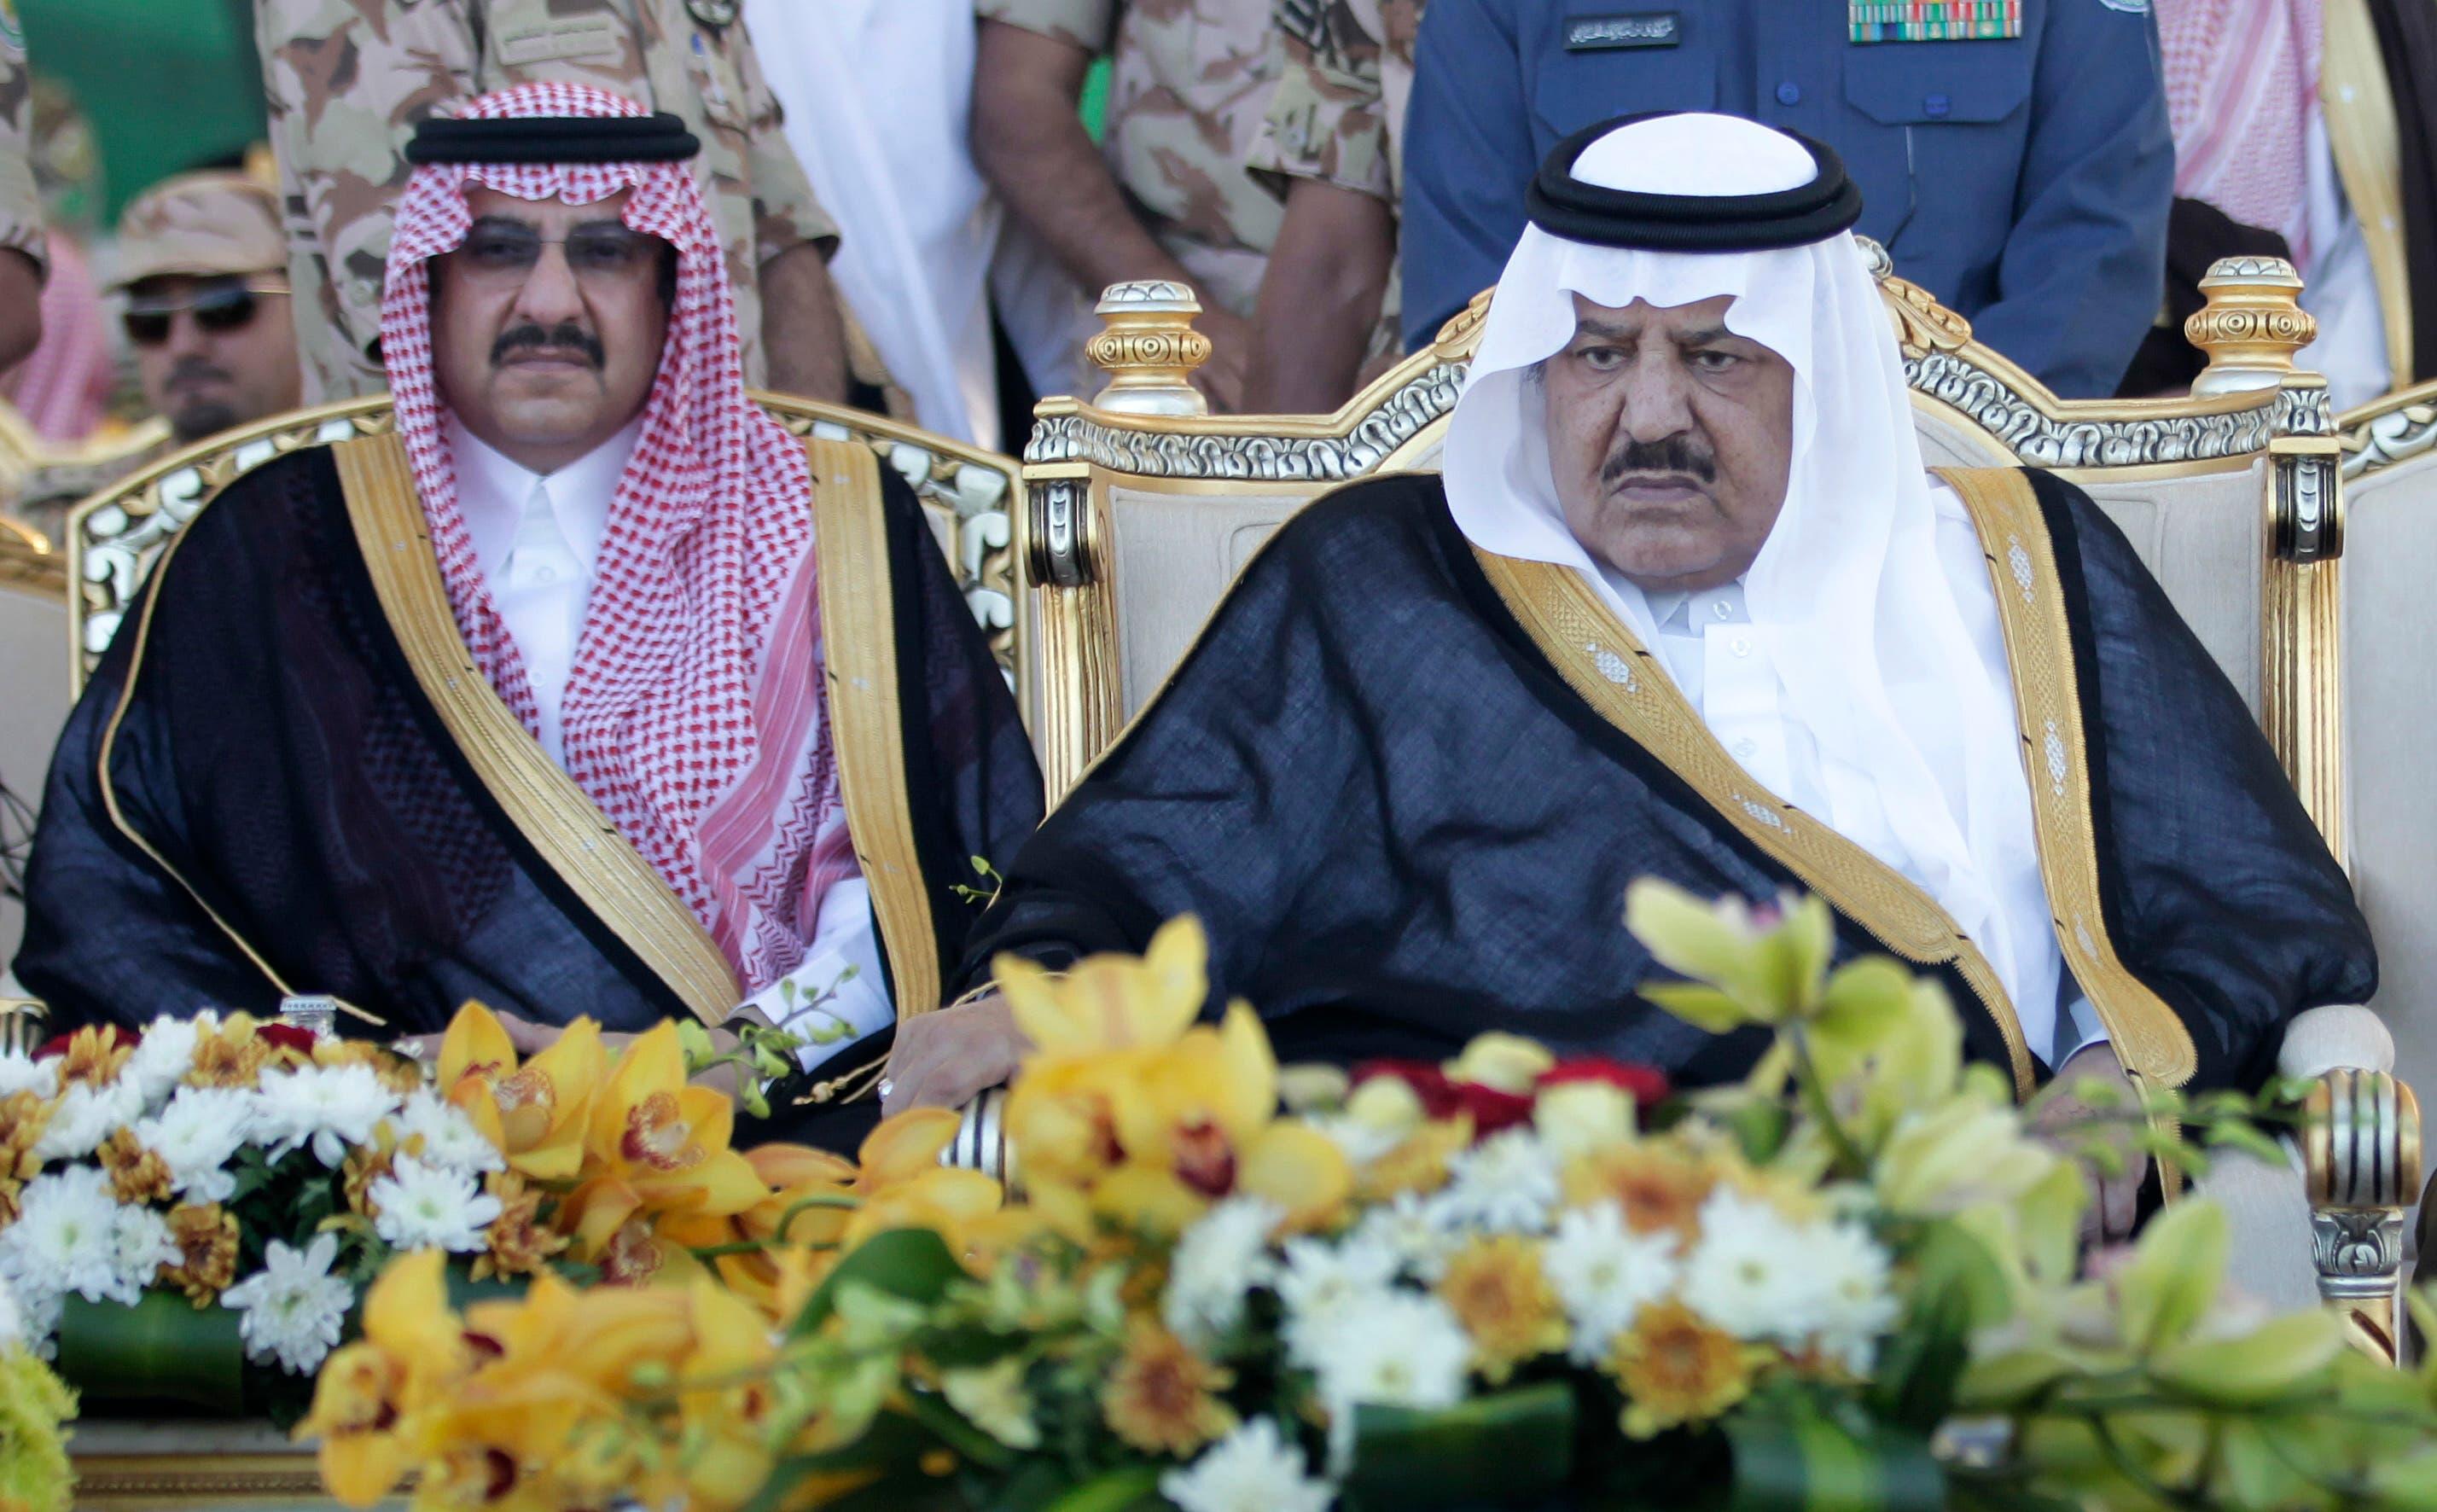 Prince Mohammed bin Nayef AP